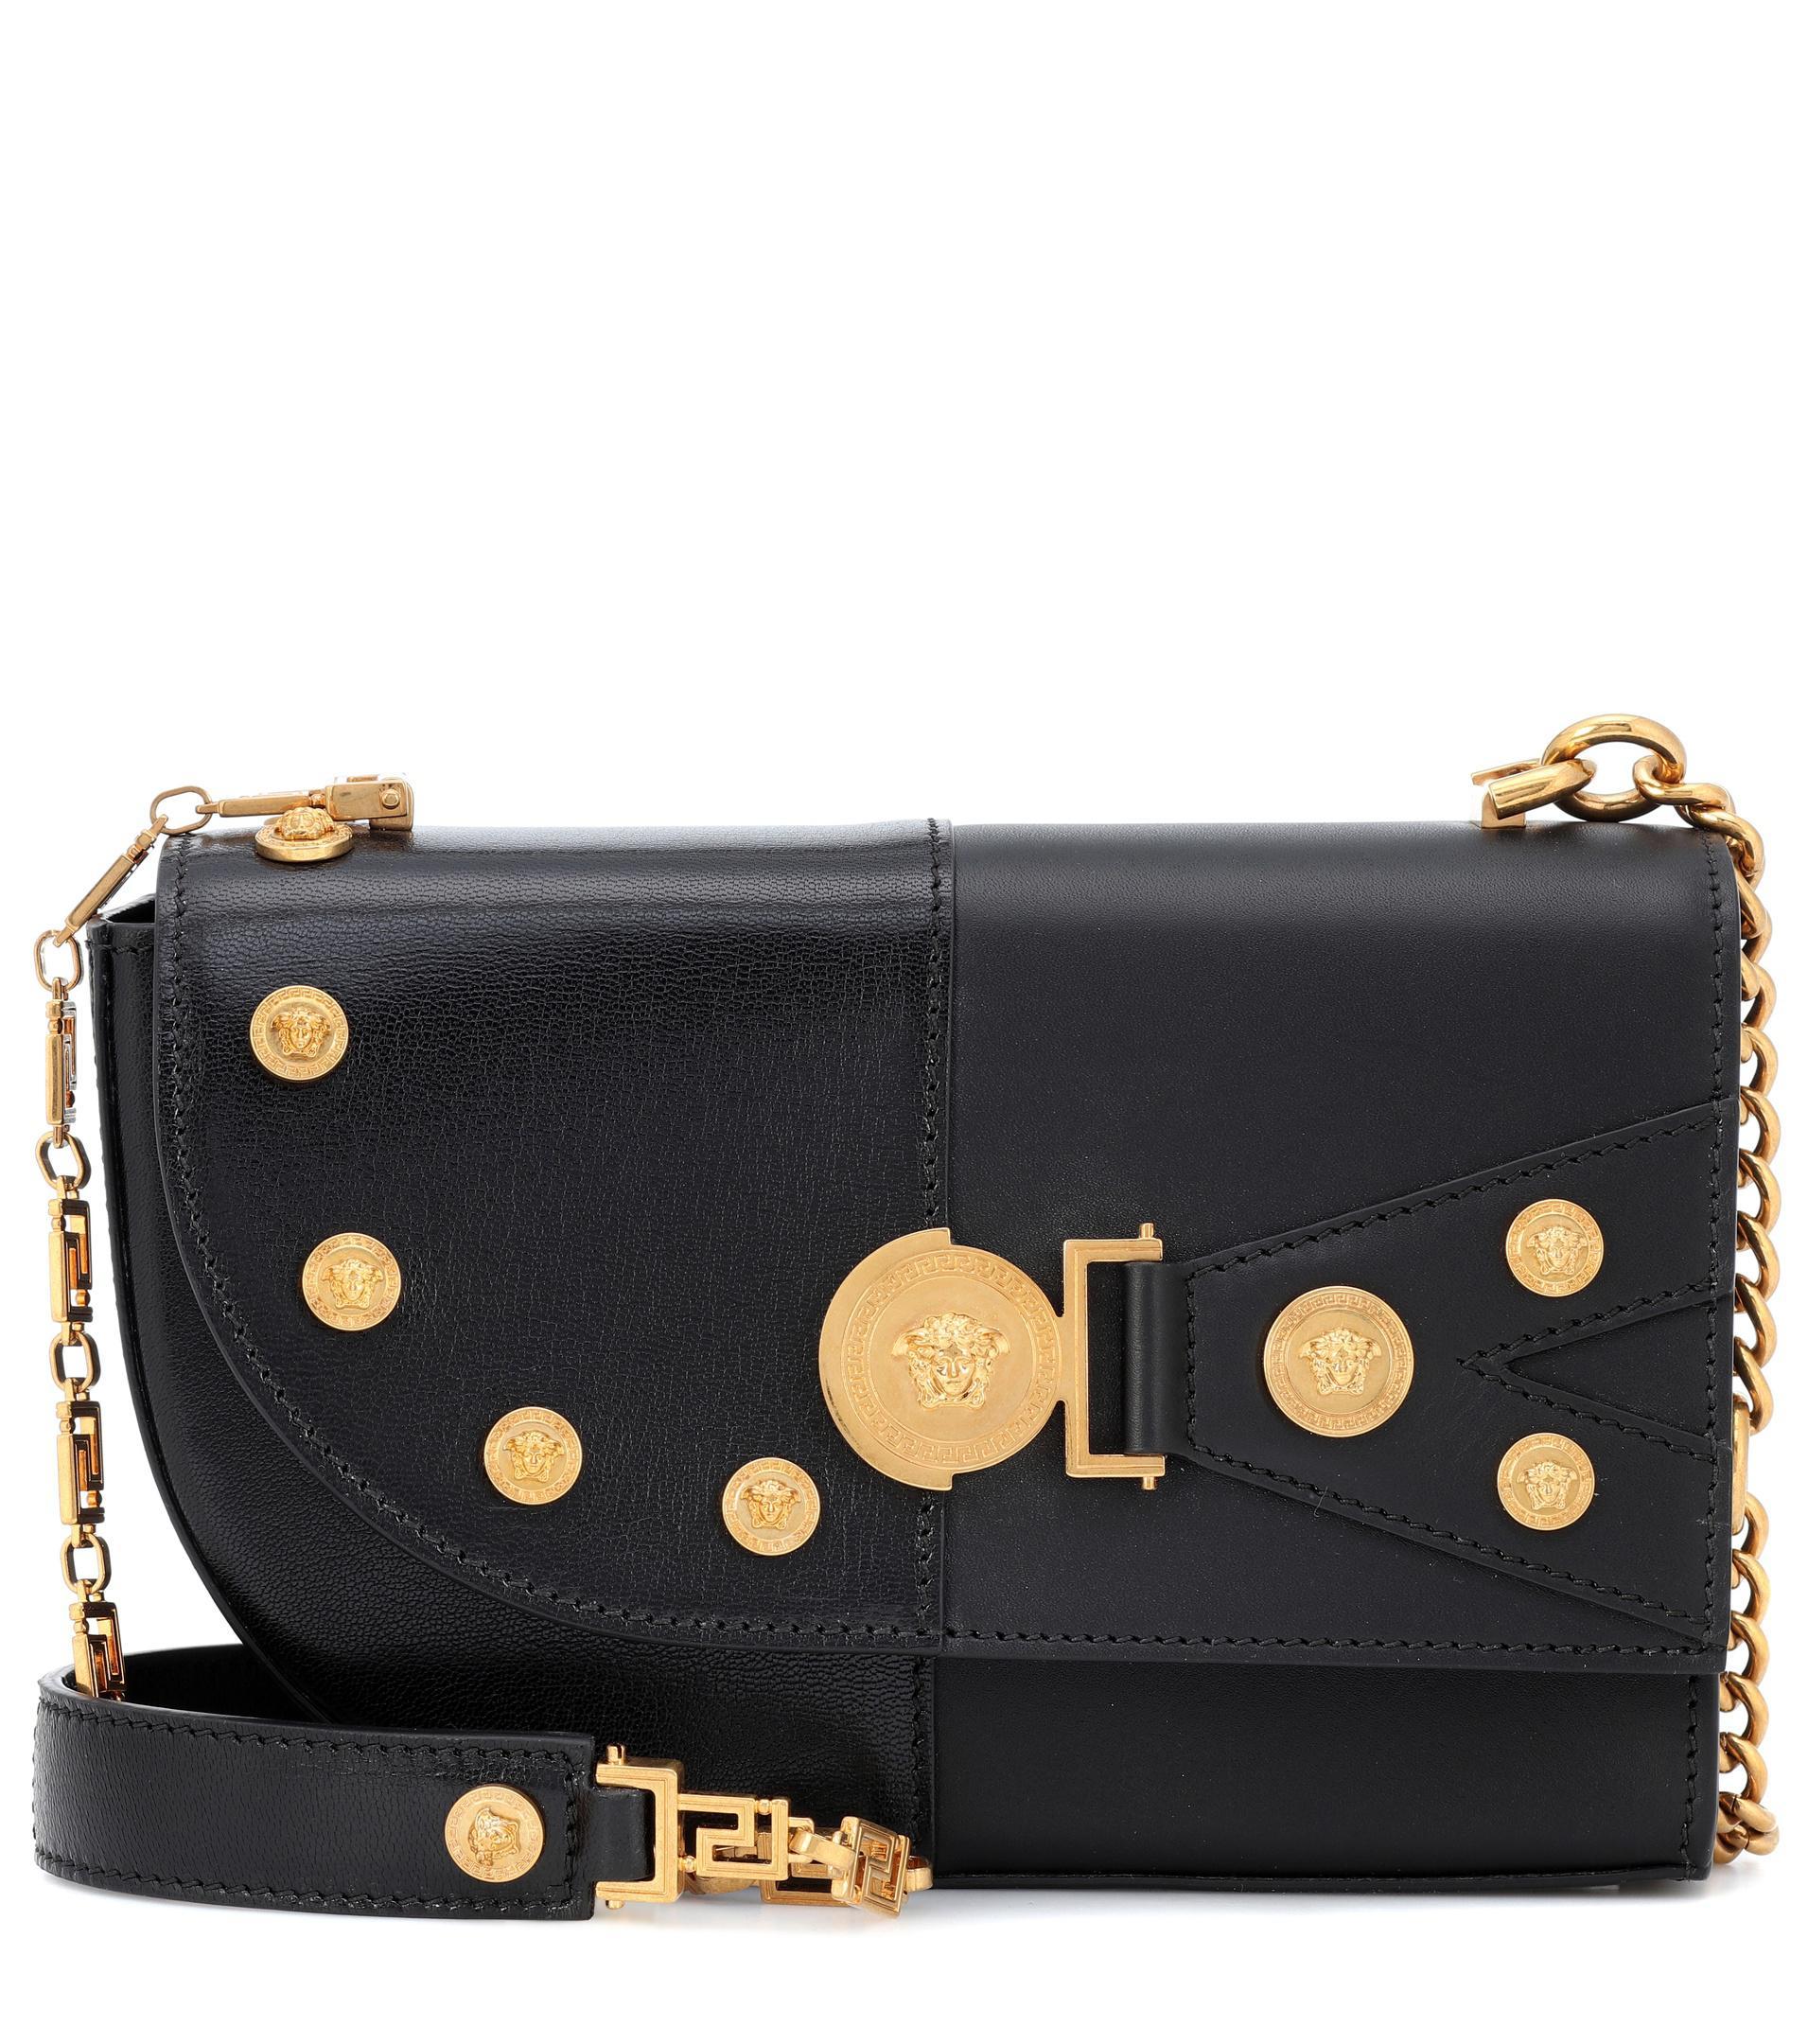 cfccf150 Versace The Clash Medium Leather Shoulder Bag in Black - Lyst